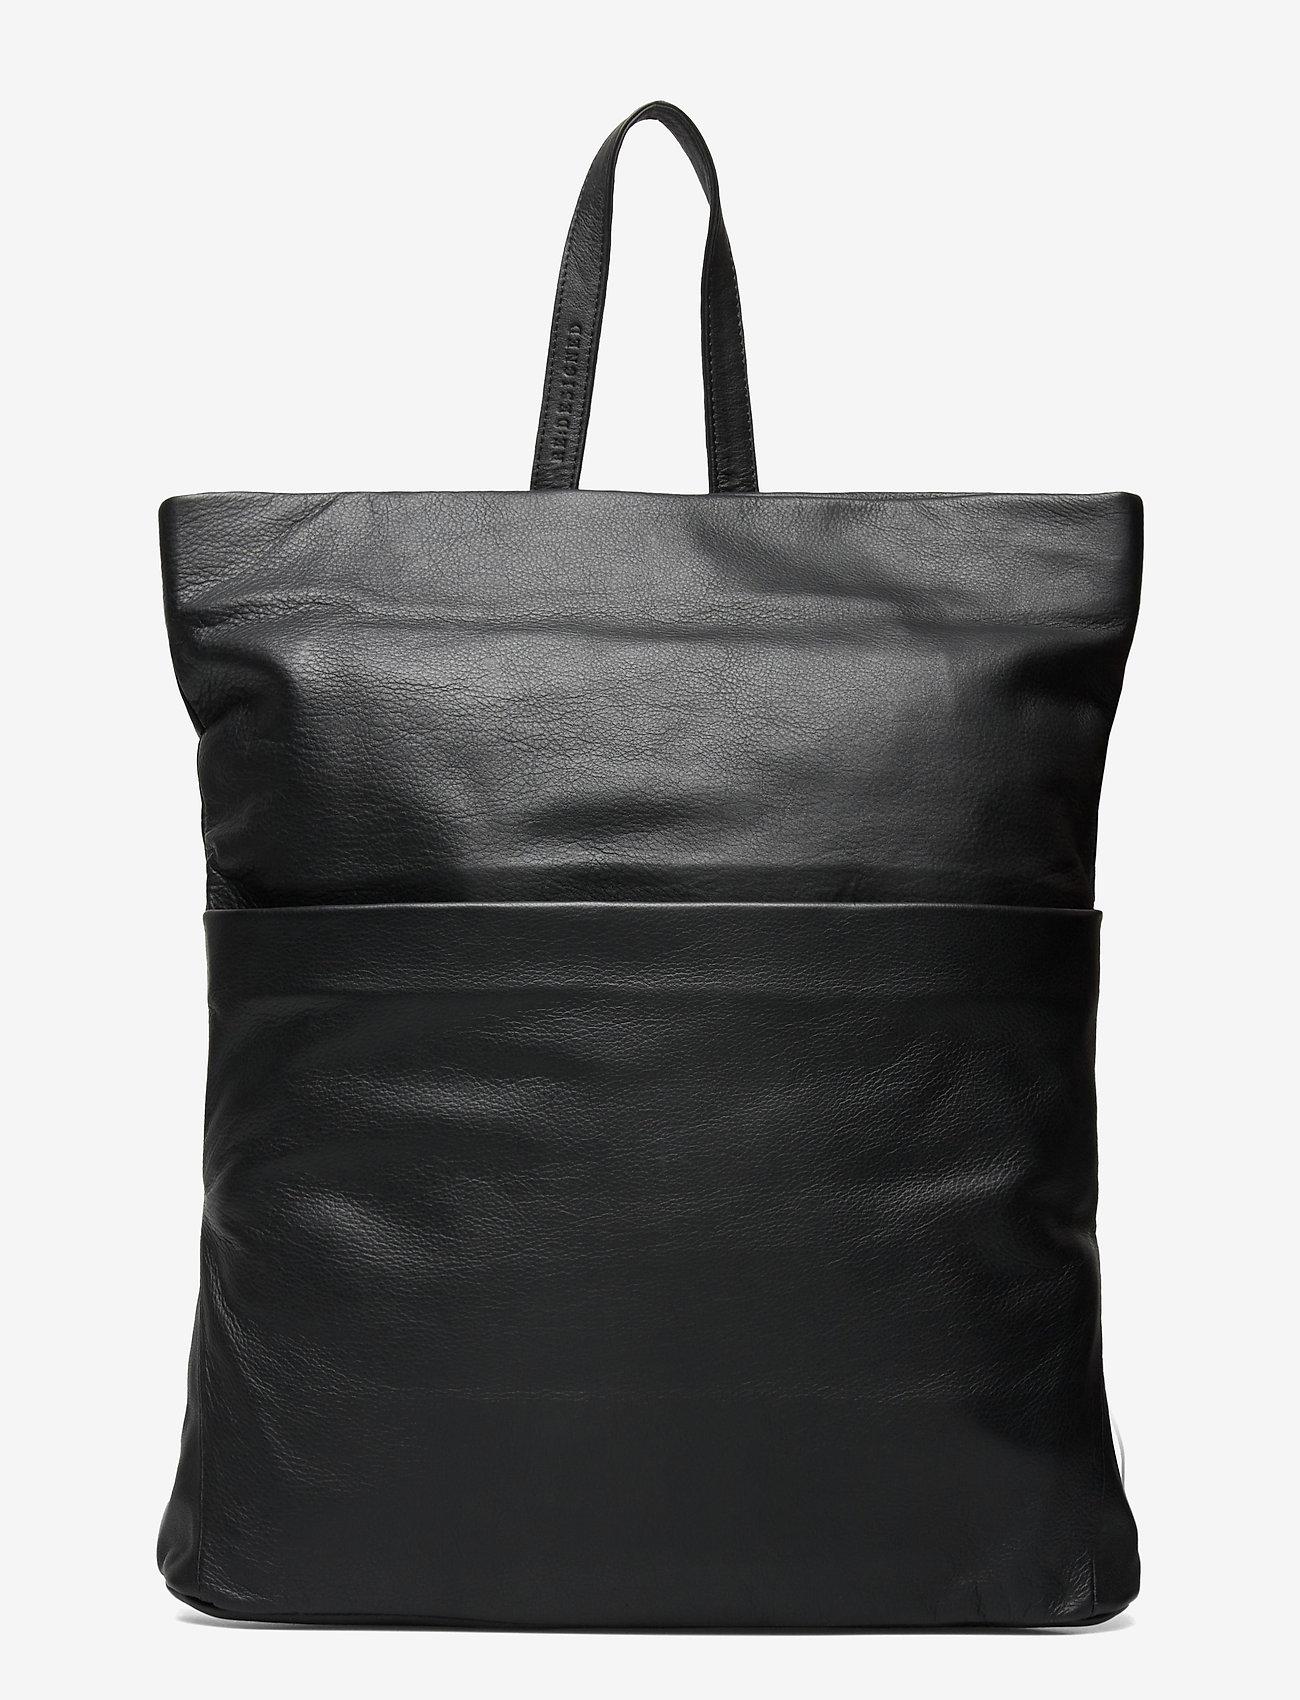 RE:DESIGNED EST 2003 - Begndal - ryggsäckar - black - 0